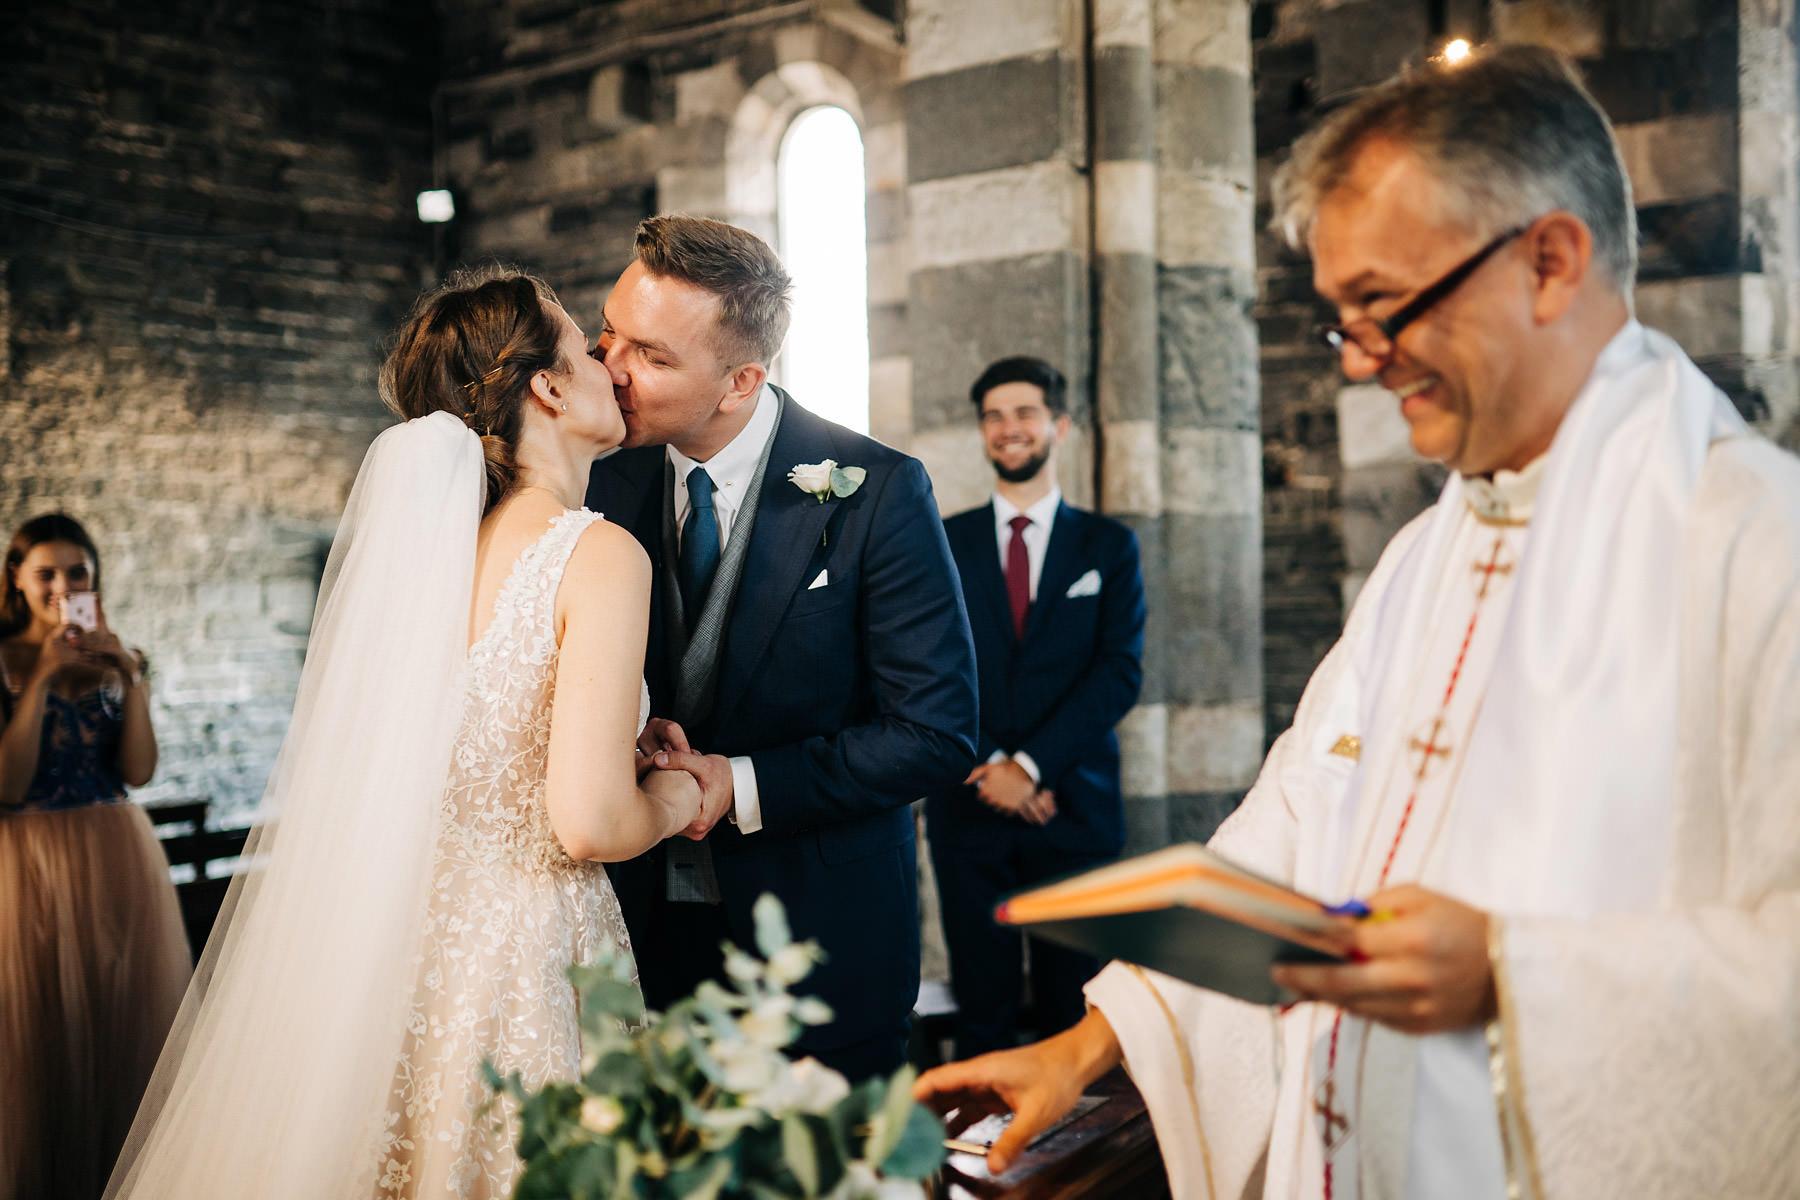 ceremonia ślubu w portovenere